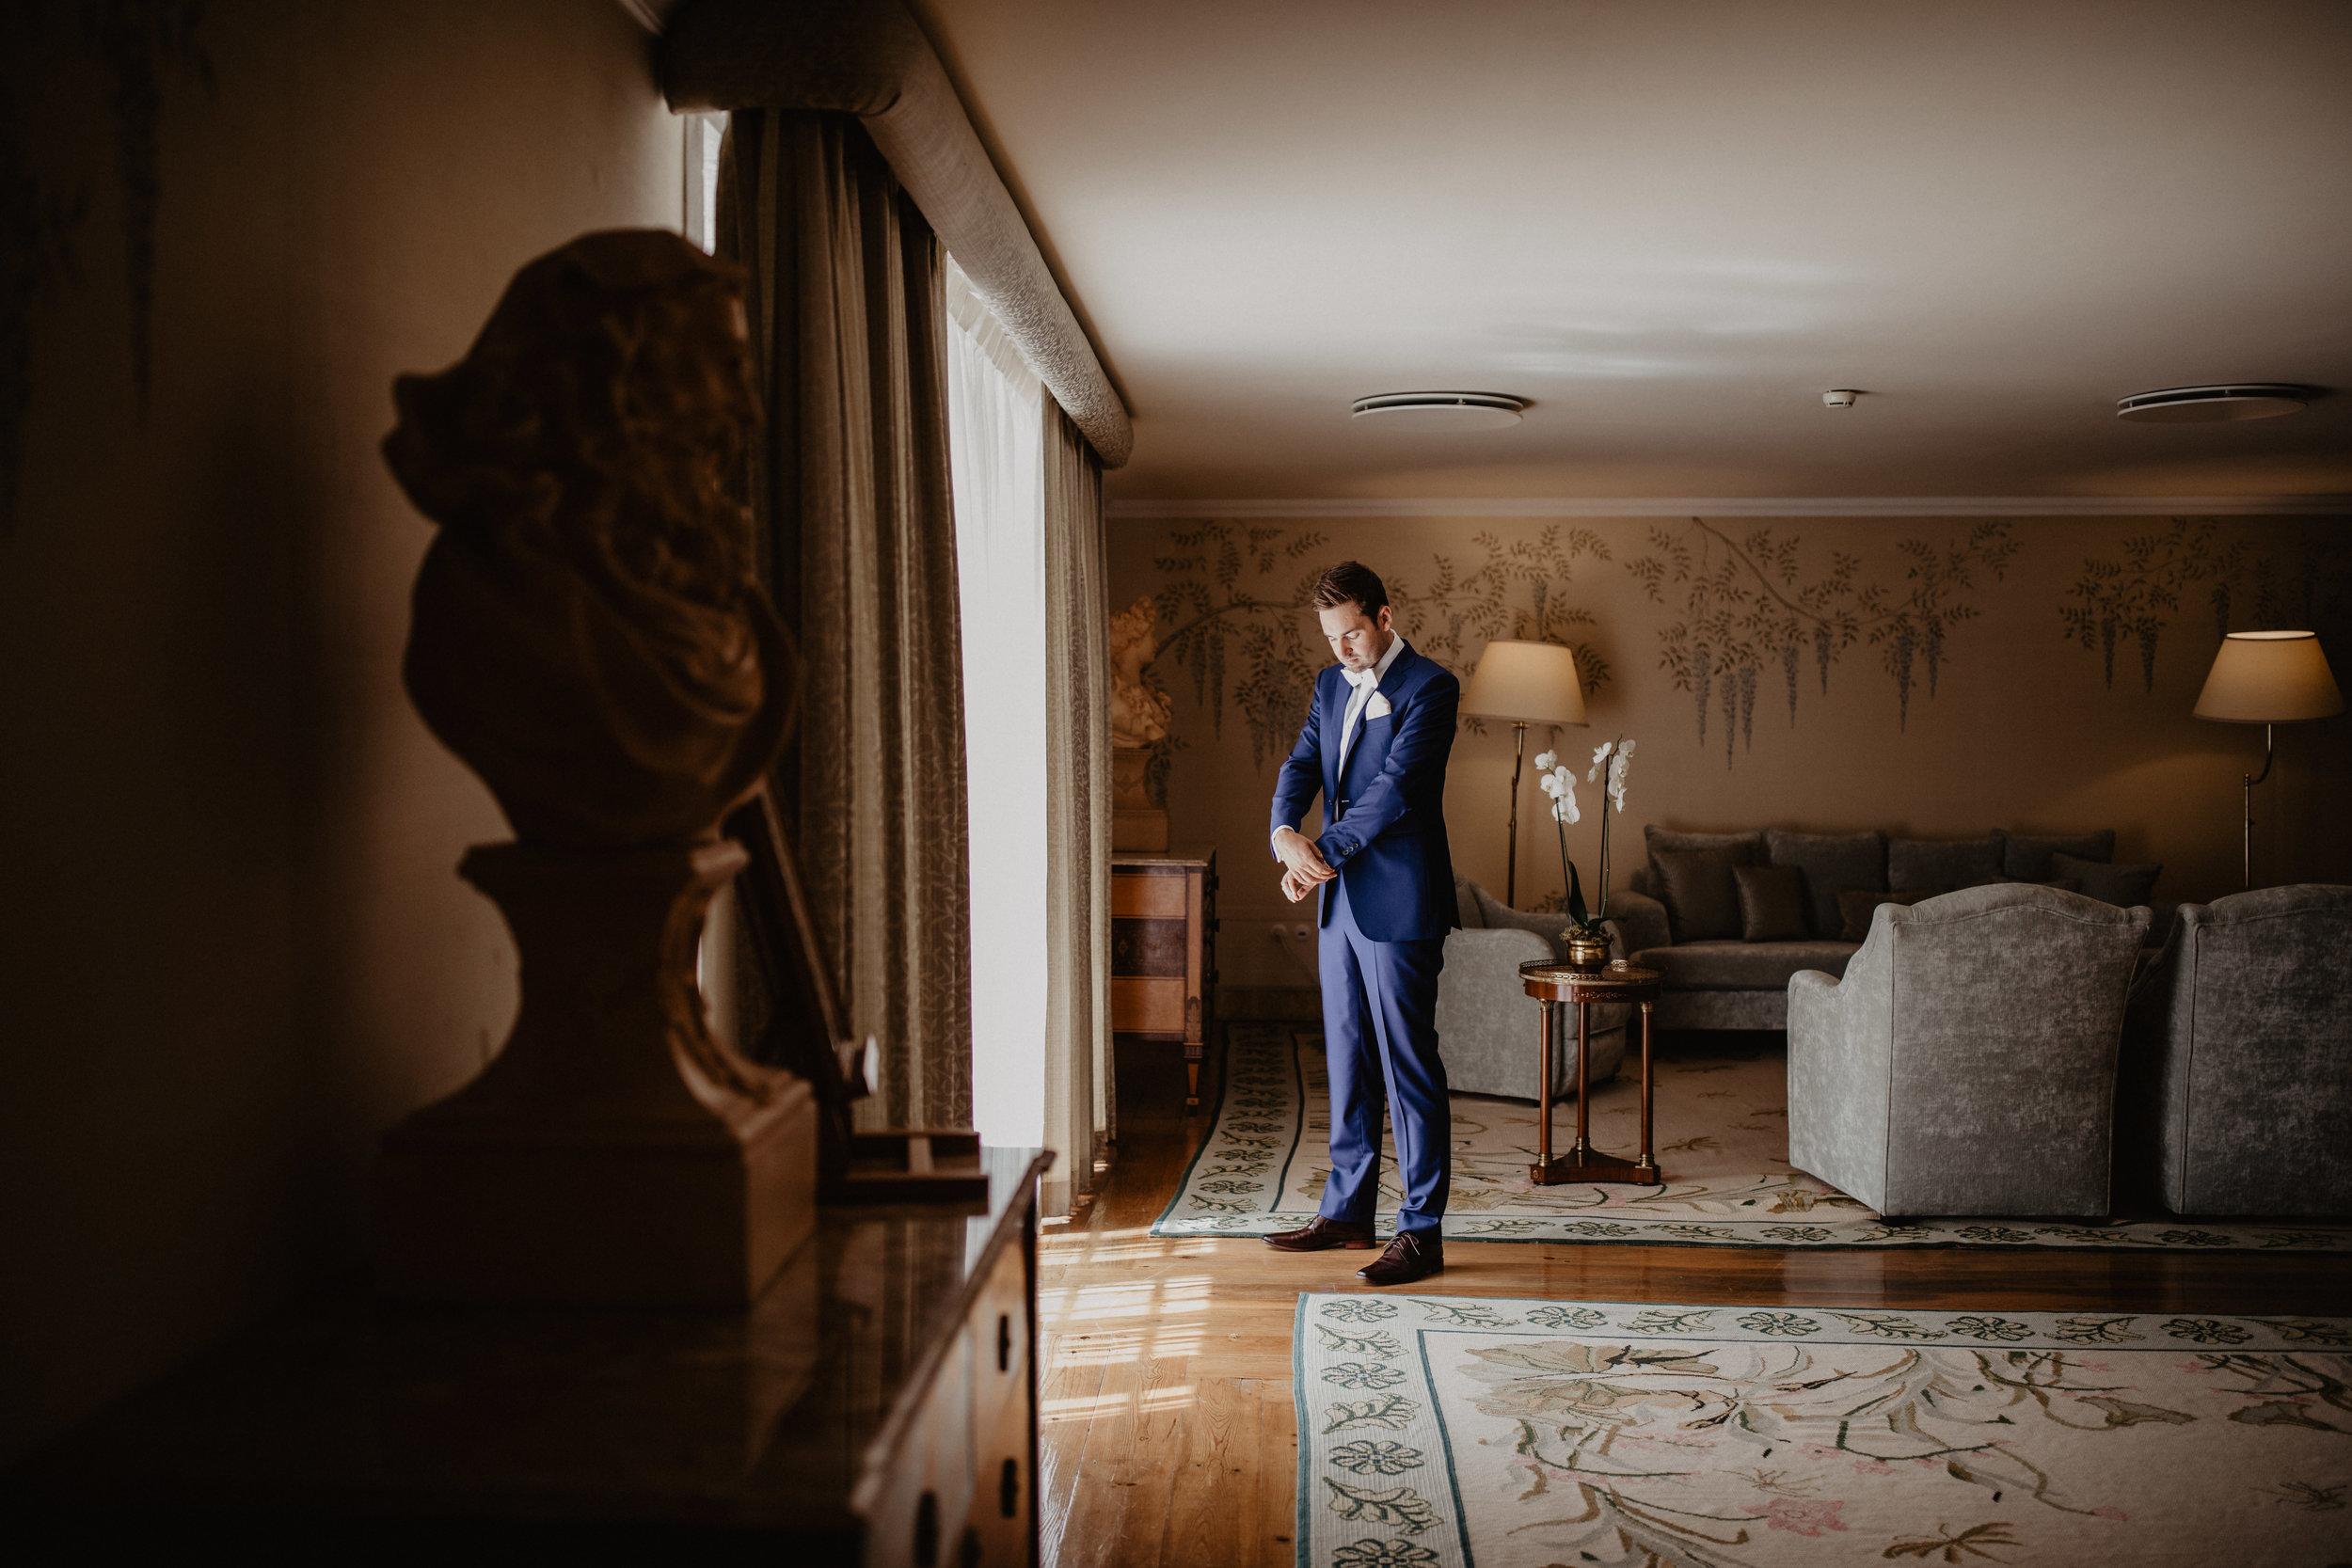 Lapela-photography-wedding-sintra-portugal-3.jpg